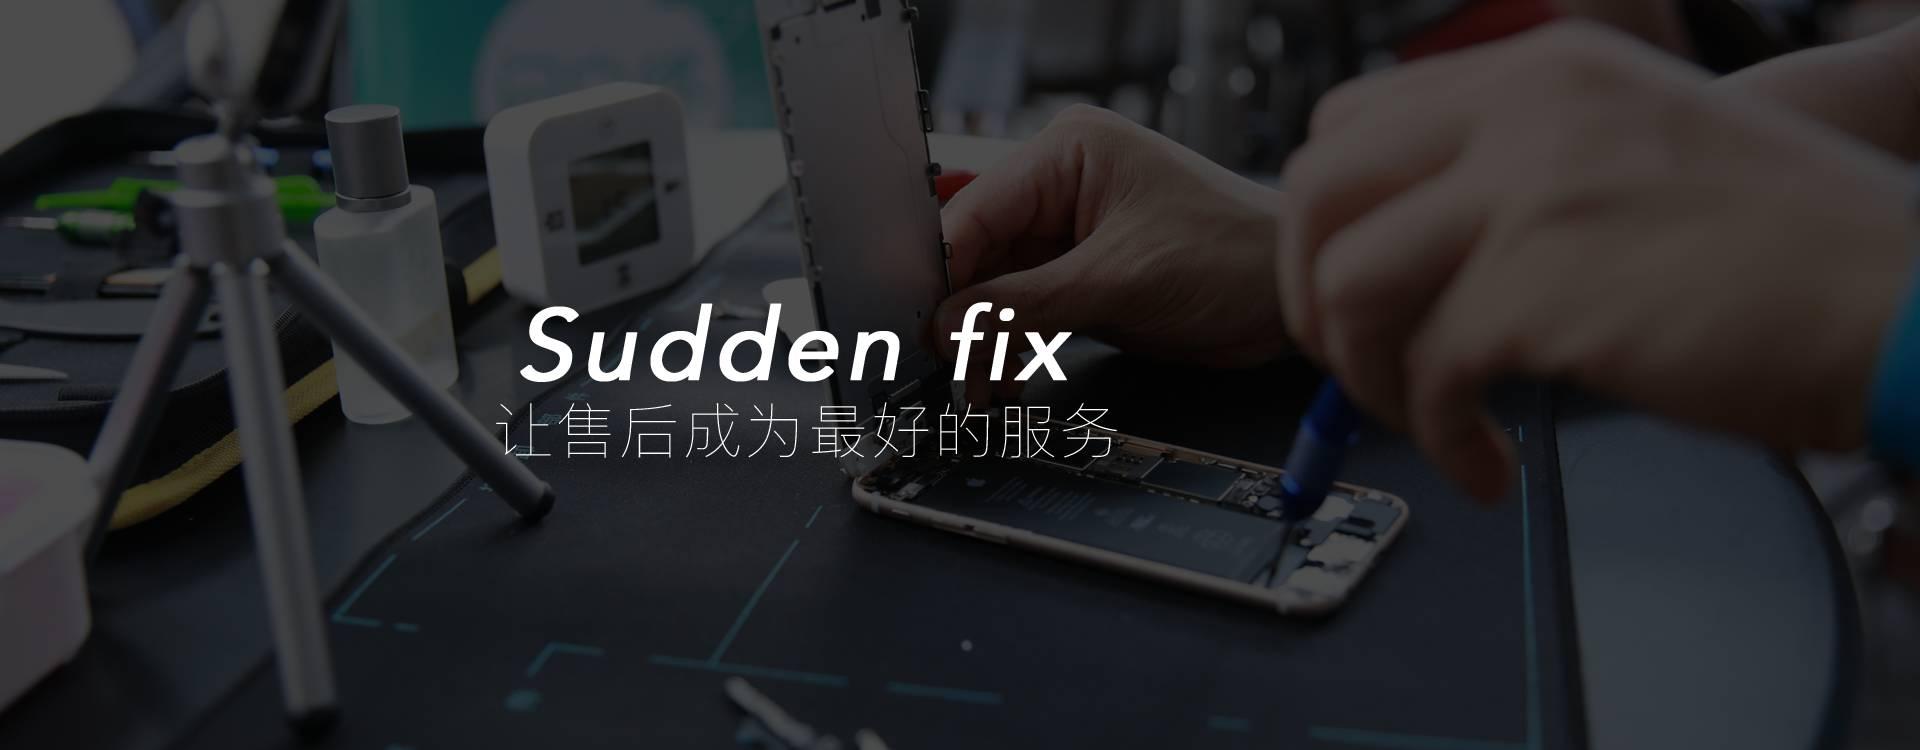 Suddenfix 让售后成为最好的服务